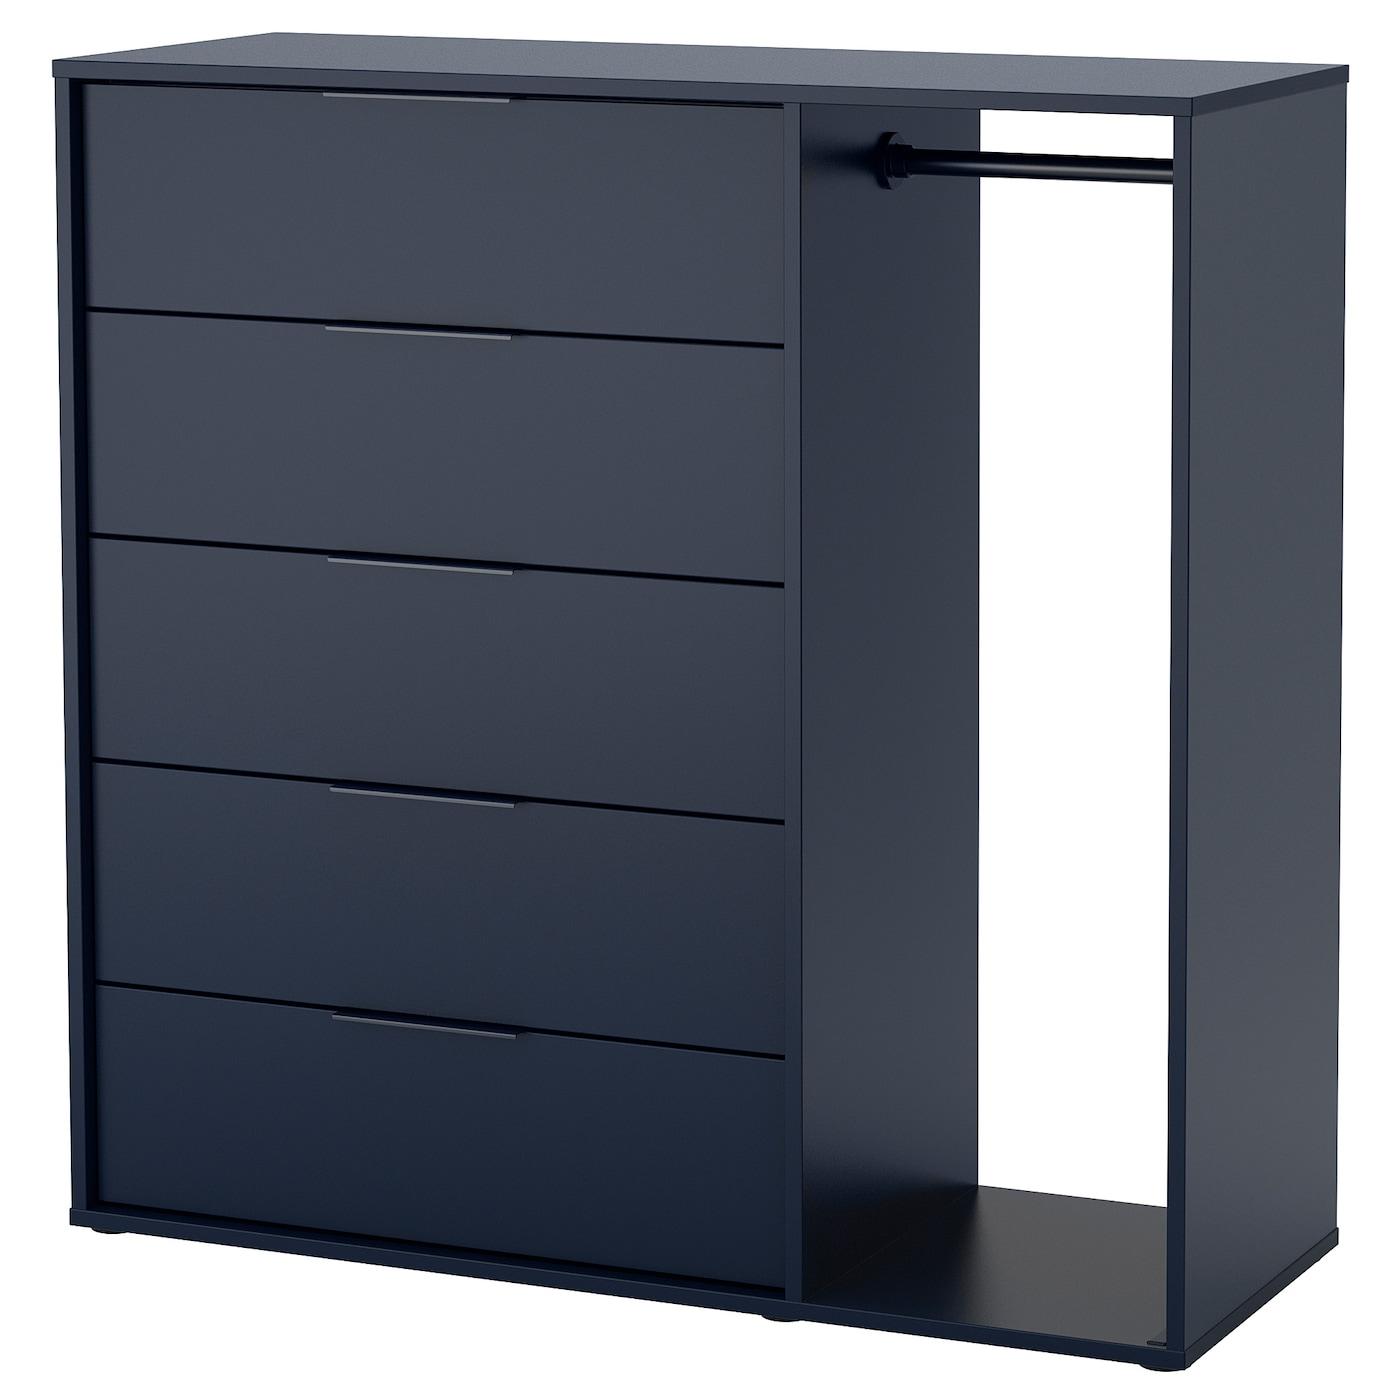 IKEA - NORDMELA Ladekast met kledingroede - 119x118 cm - Zwartblauw